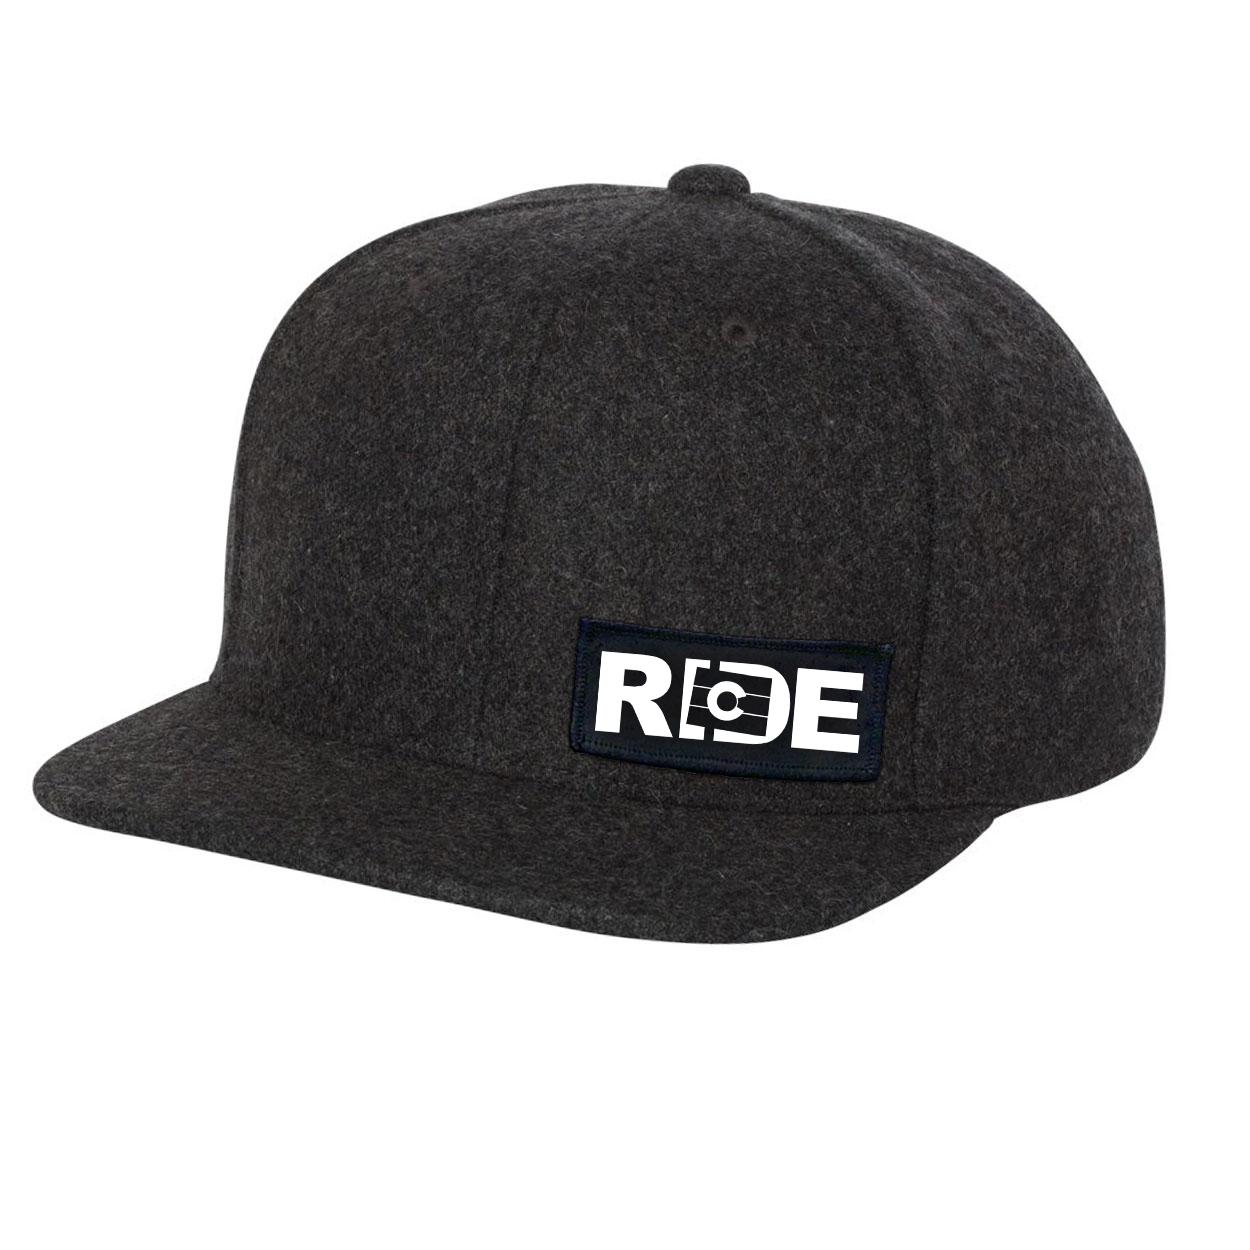 Ride Colorado Night Out Woven Patch Flat Brim Snapback Hat Dark Heather Gray Wool (White Logo)